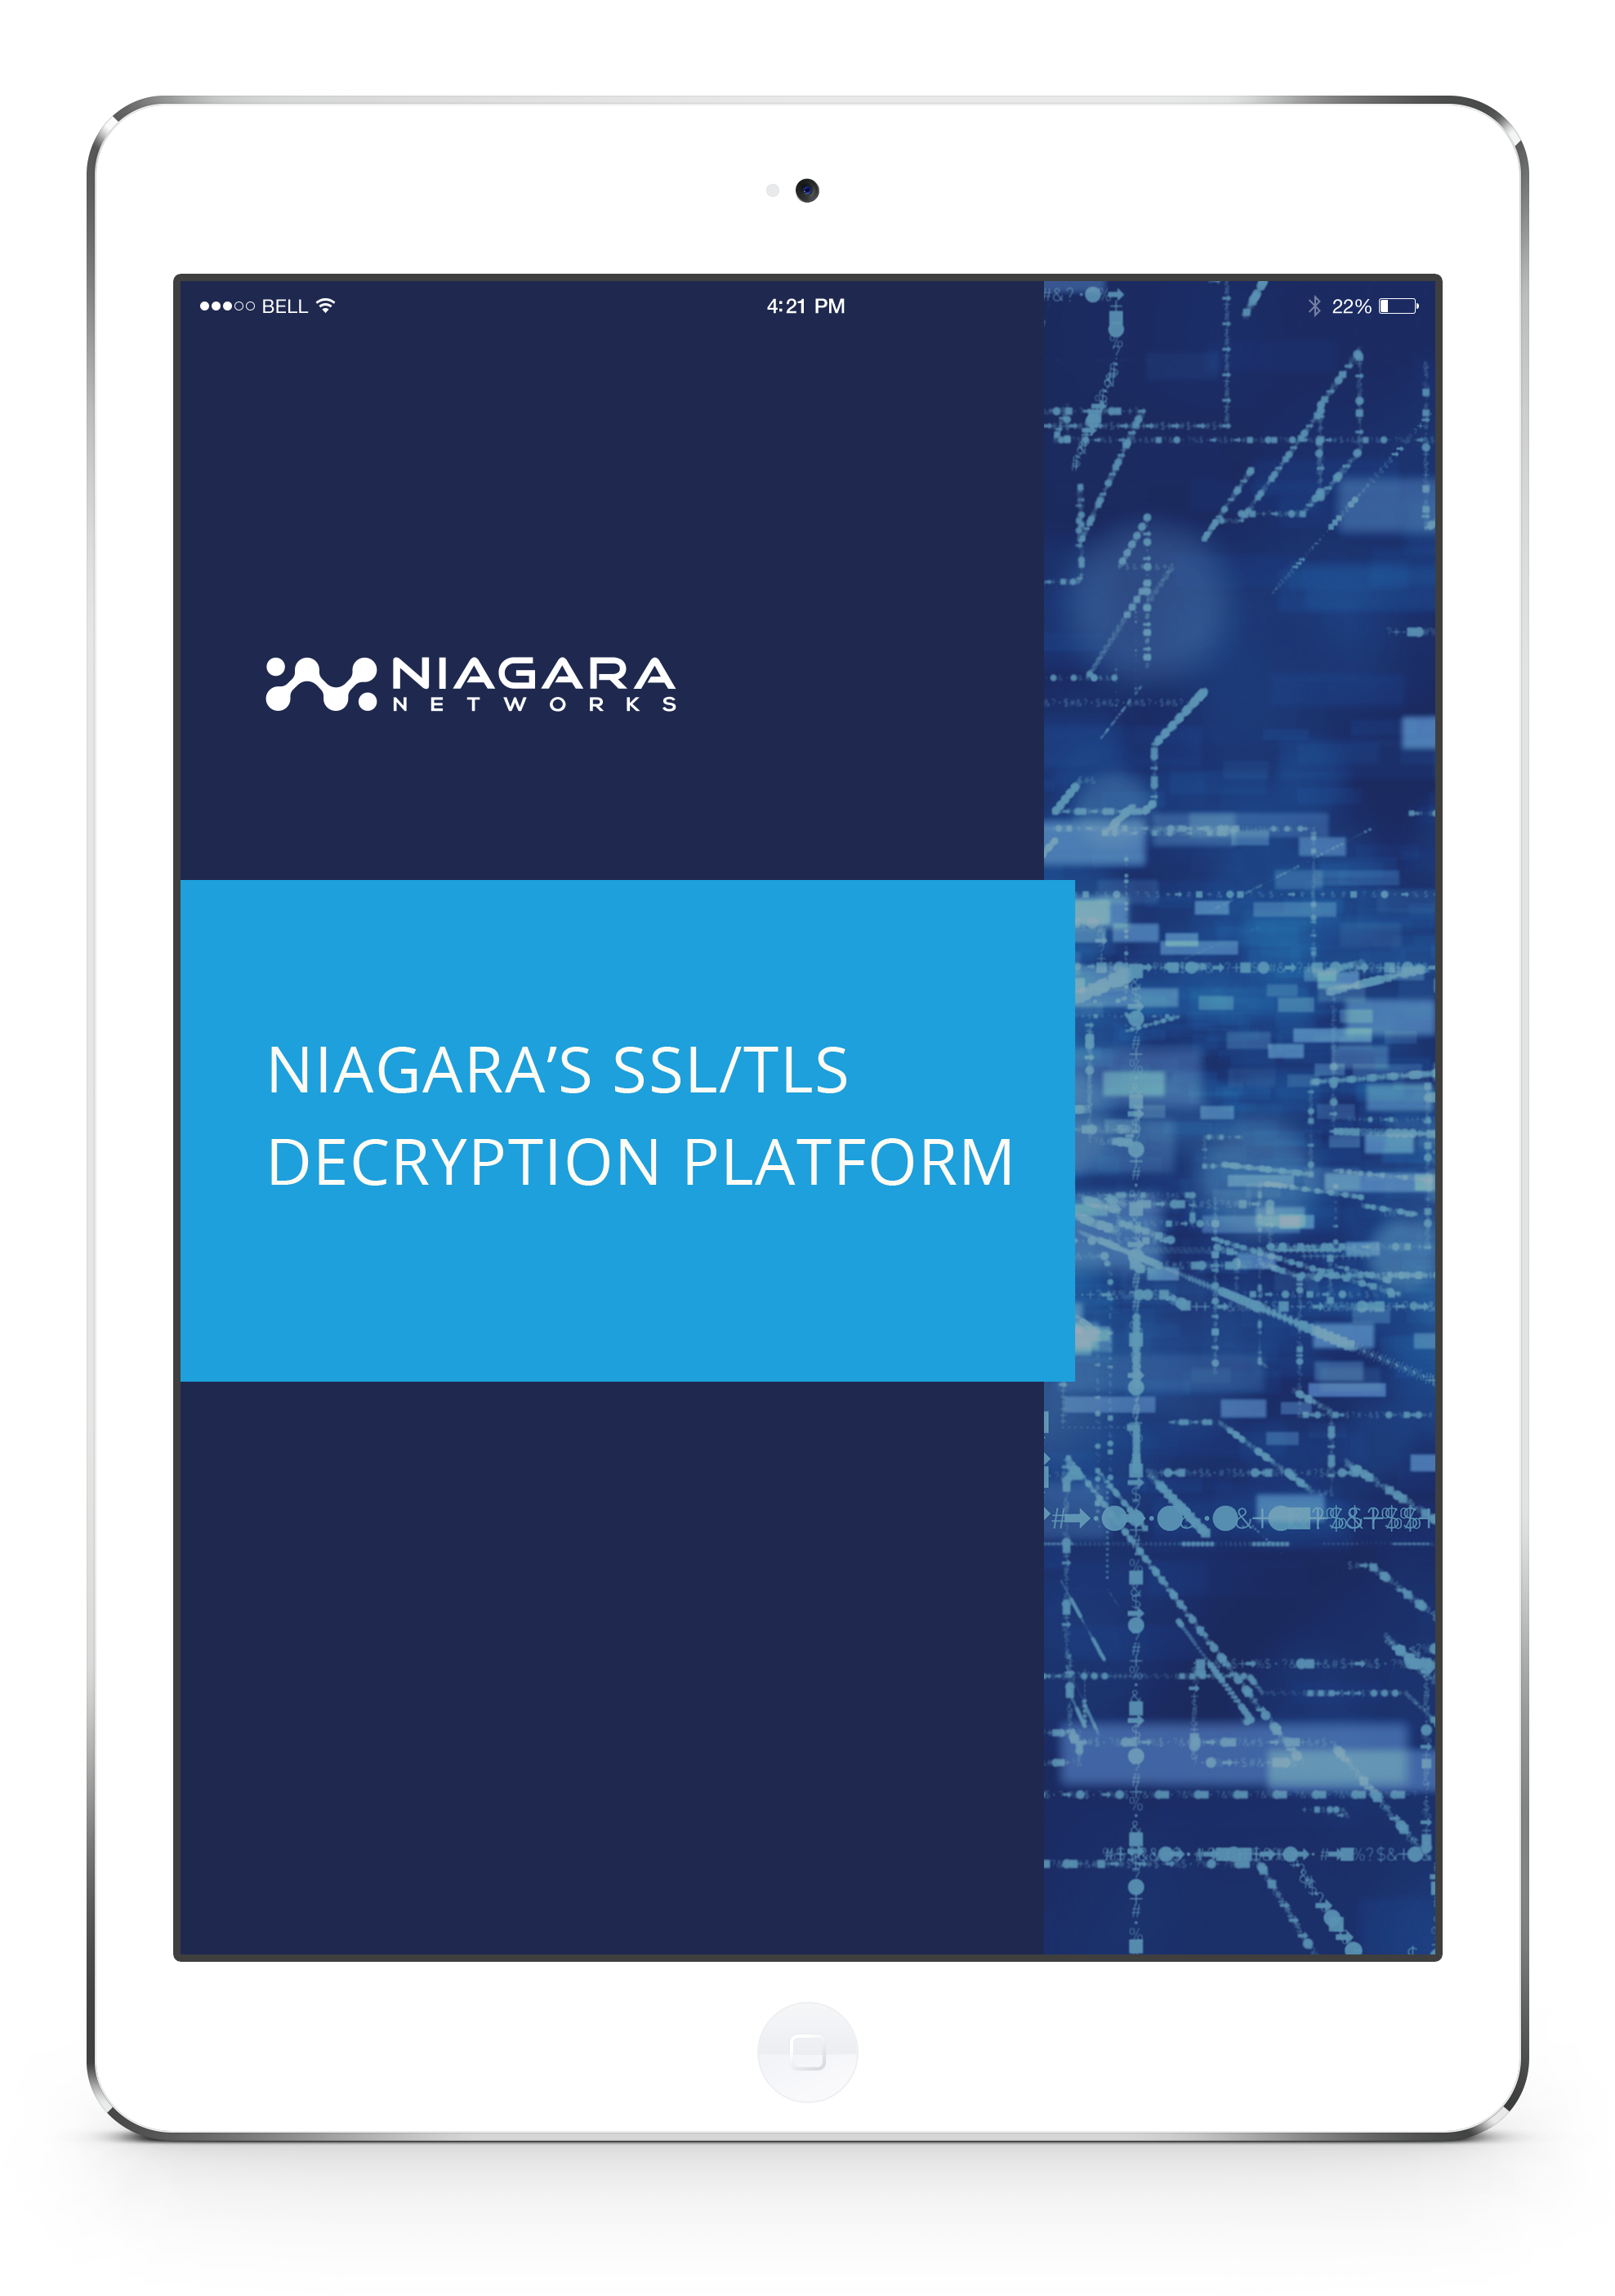 Niagara's SSL/TLS Decryption Platform - LP image